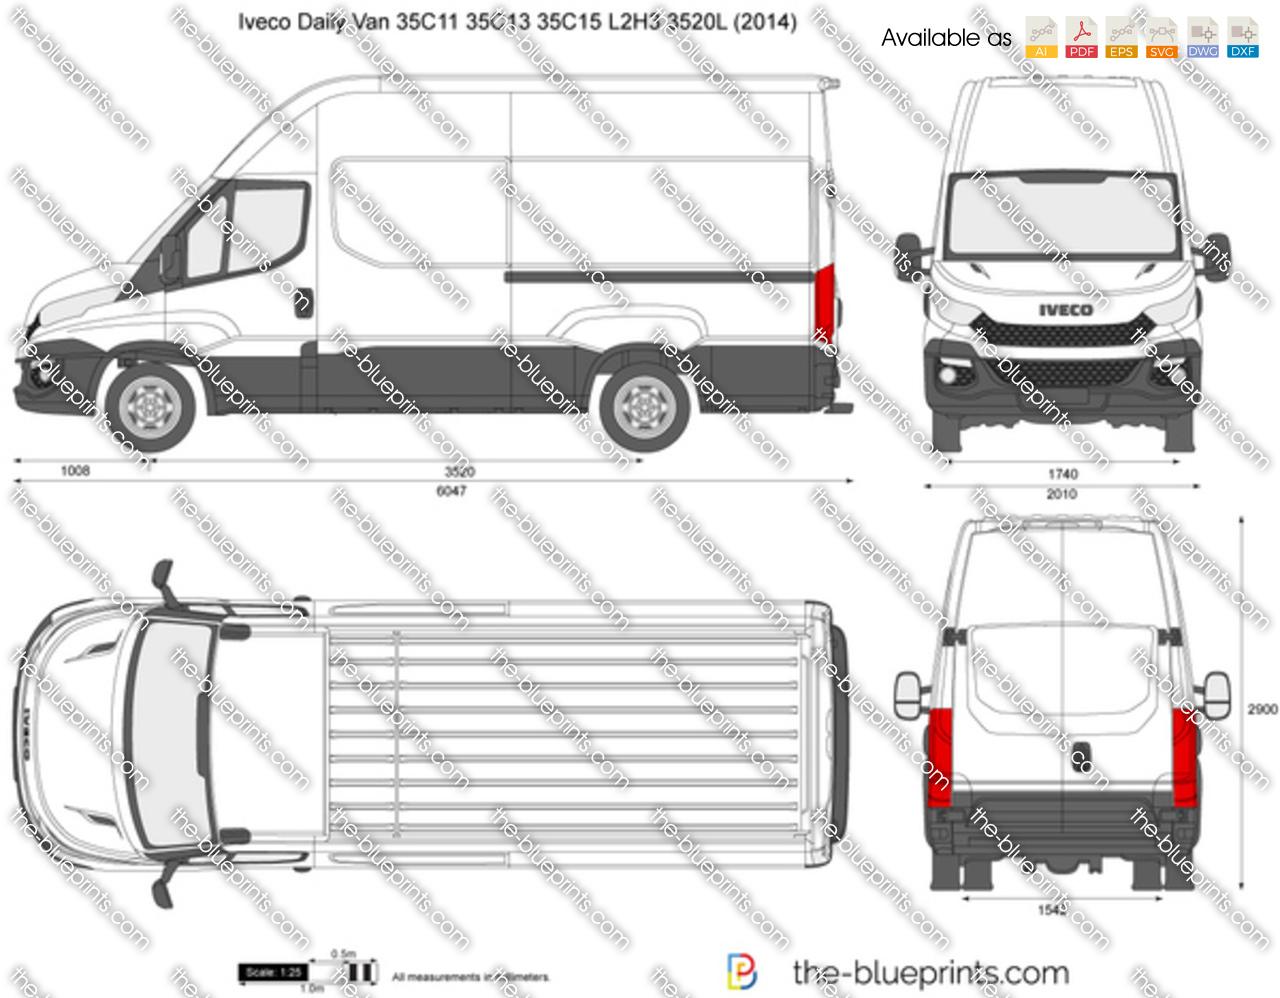 Iveco Daily Van 35C11 35C13 35C15 L2H3 3520L 2017